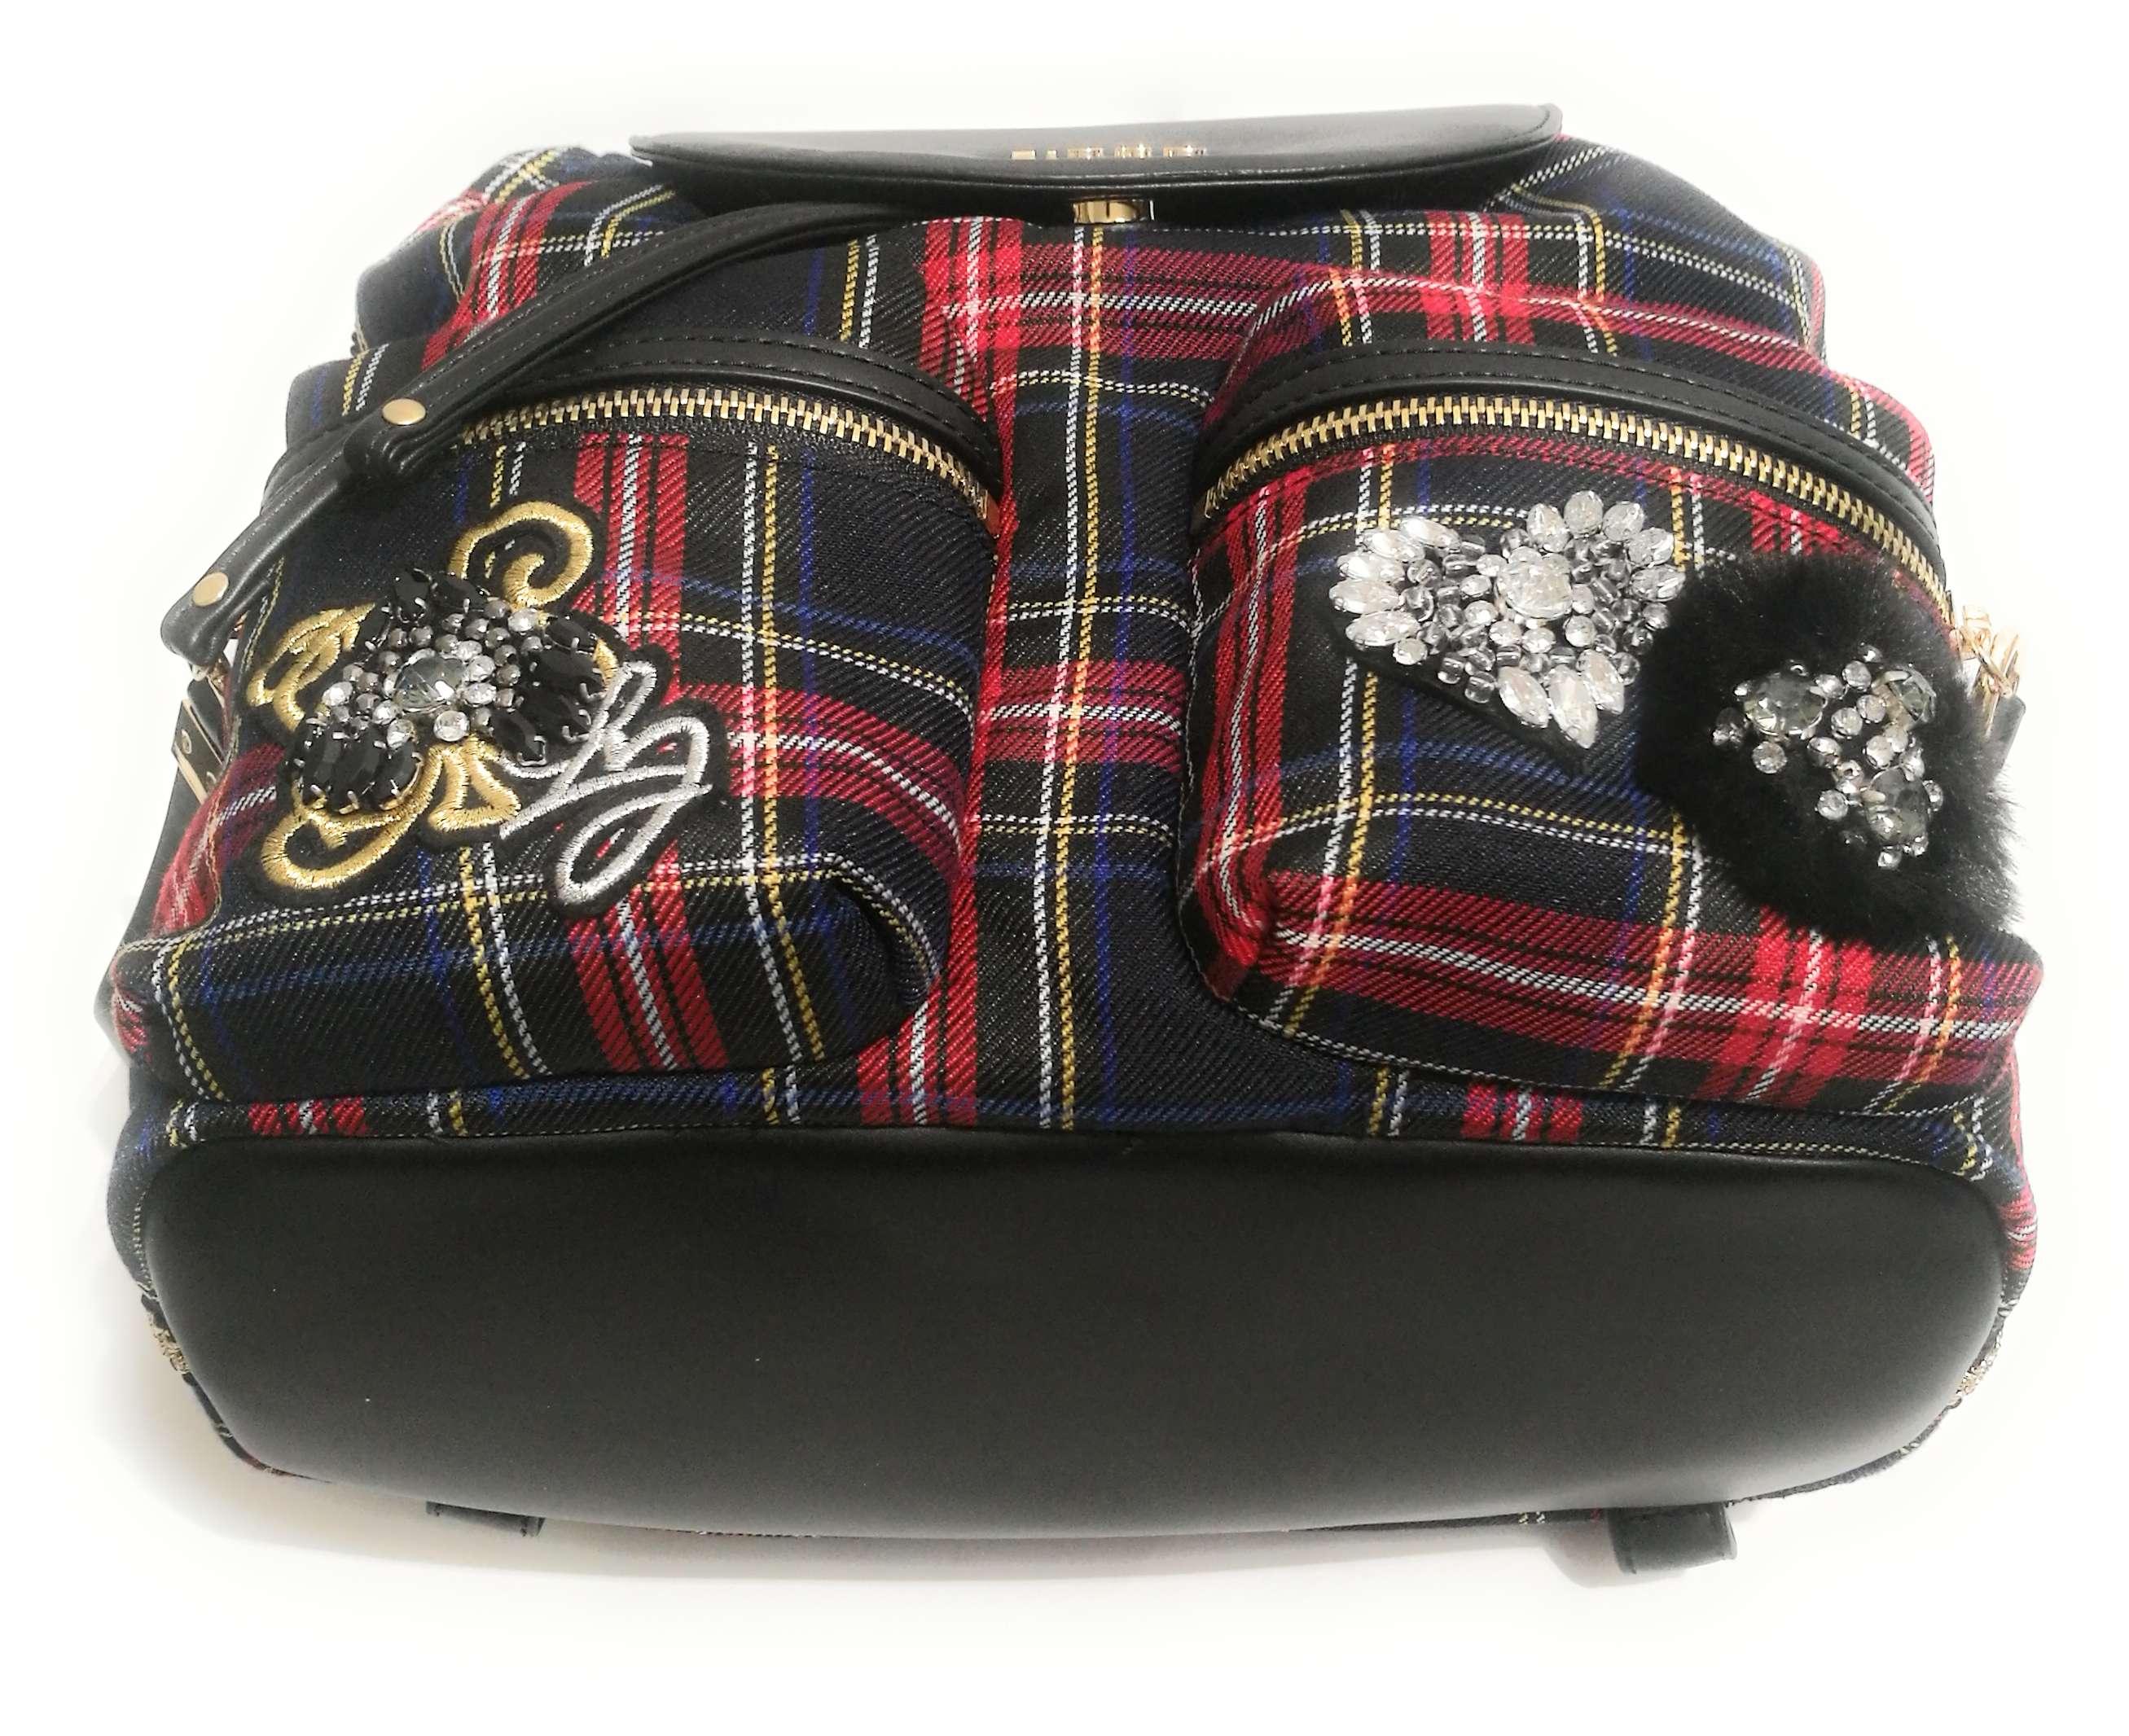 Zaino Liu-Jo Brenta Checkered Tartan Backpack Medium Donna B19Lj54 4 4 di 4  Vedi Altro c78f2ed6e8b